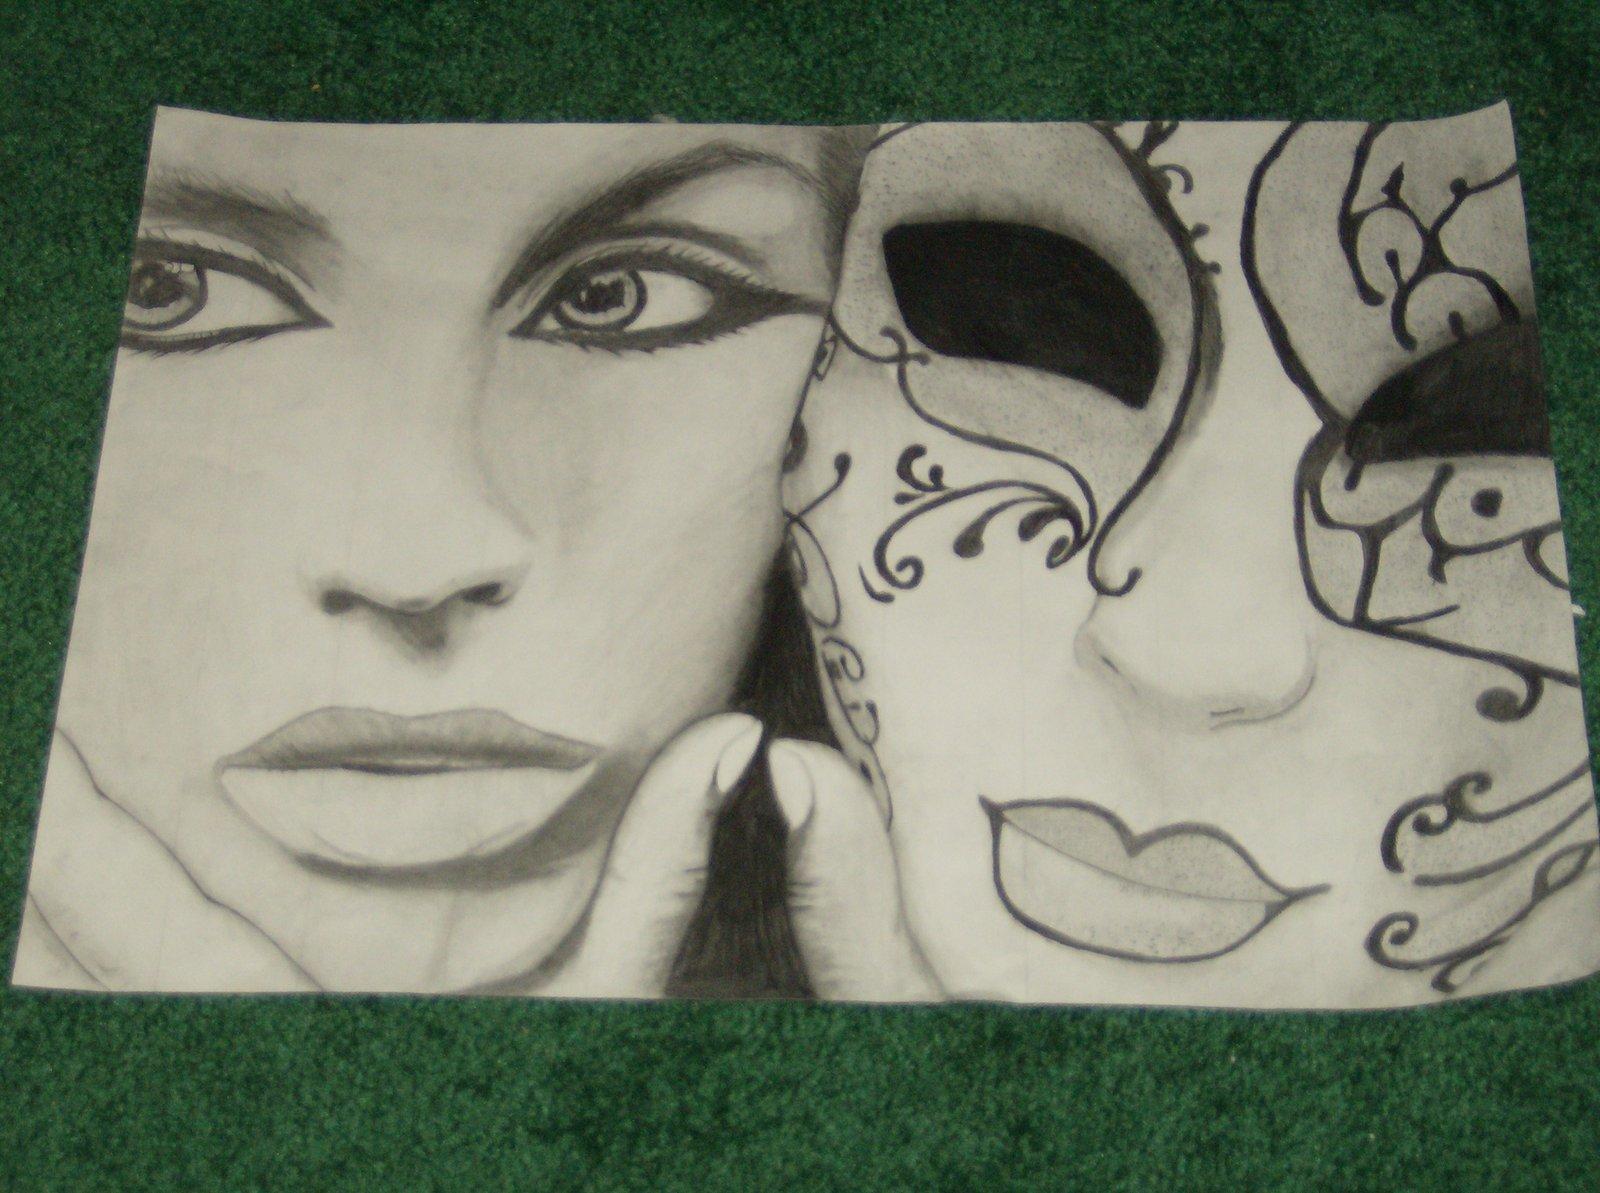 Drawn masks face drawing Mask Behind Face SasoriMaster on